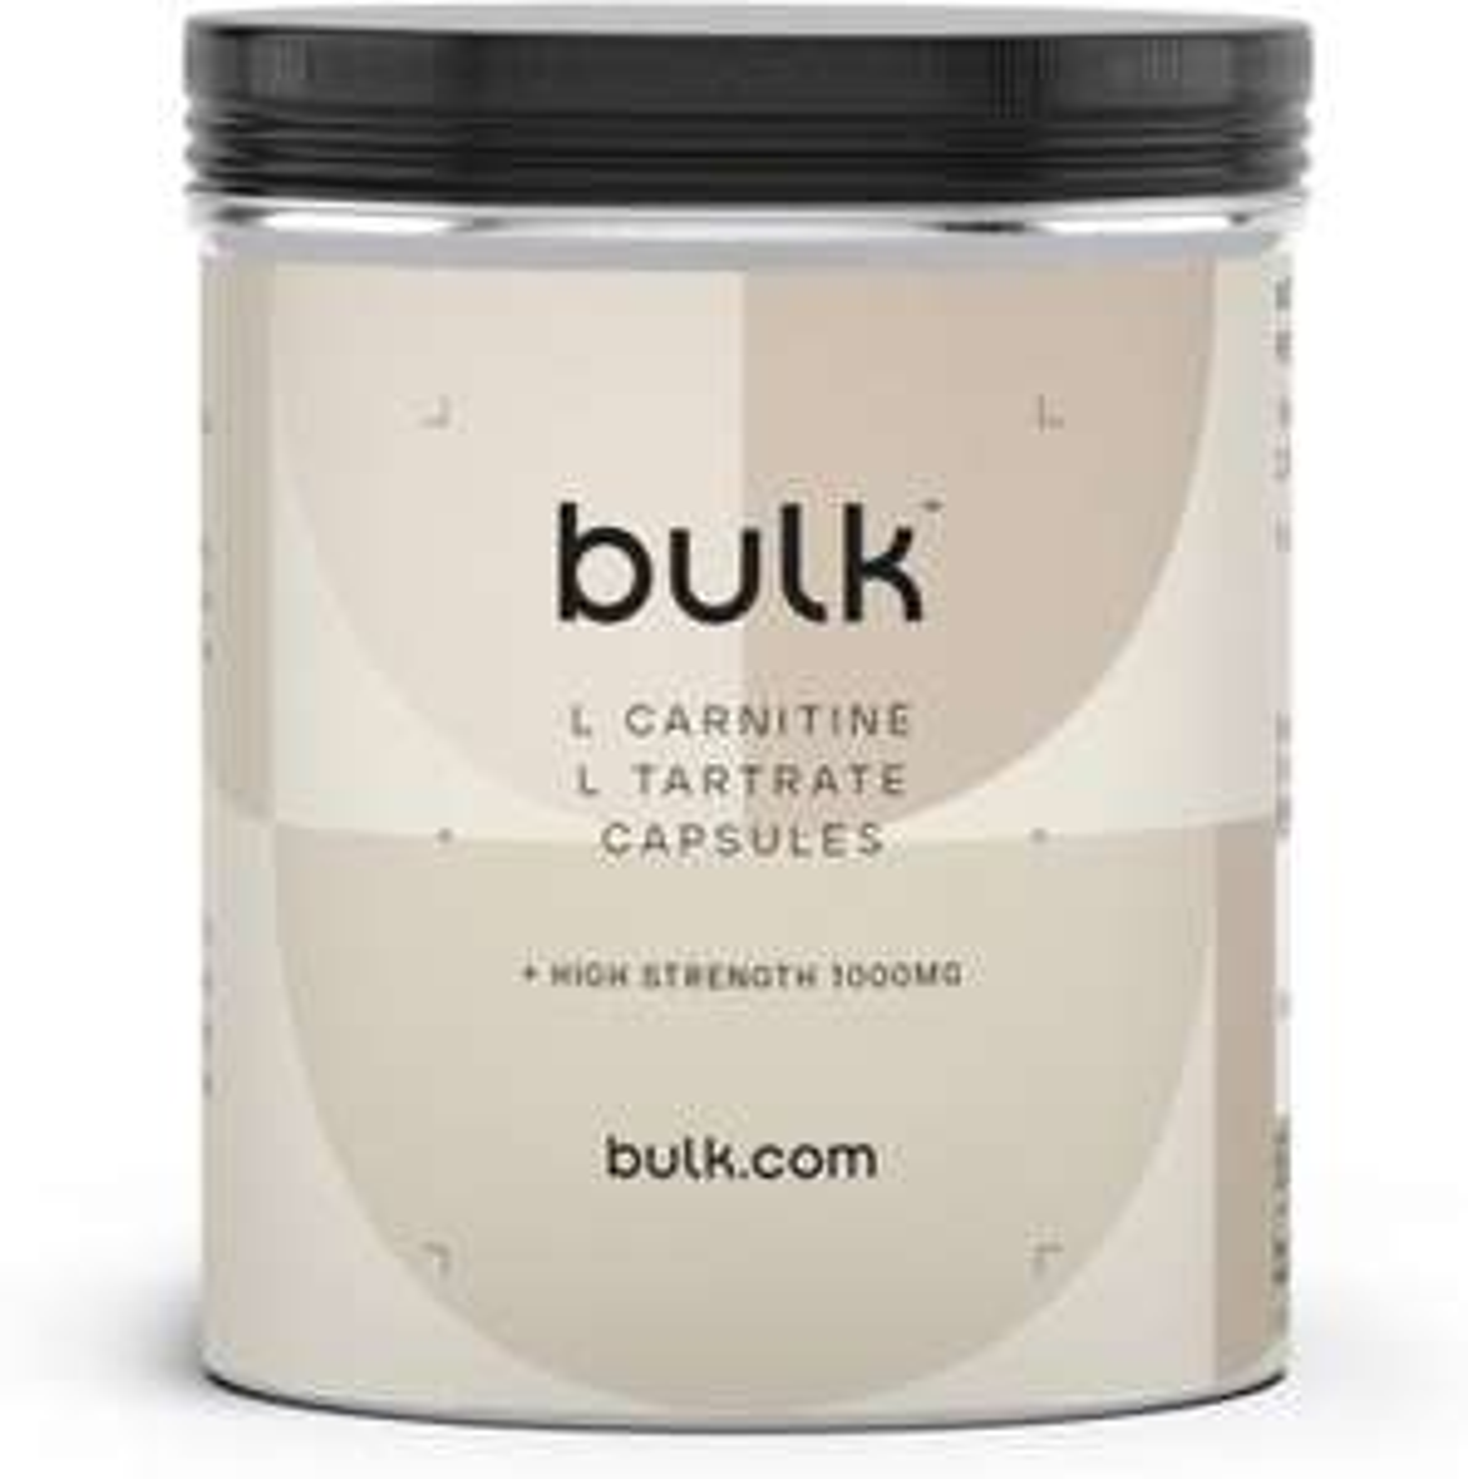 BULK POWDERS L-Carnitine, L-Tartrate Capsules, 1000mg, Pack of 90 £9.74 Amazon Prime / £14.23 Non Prime @ Amazon